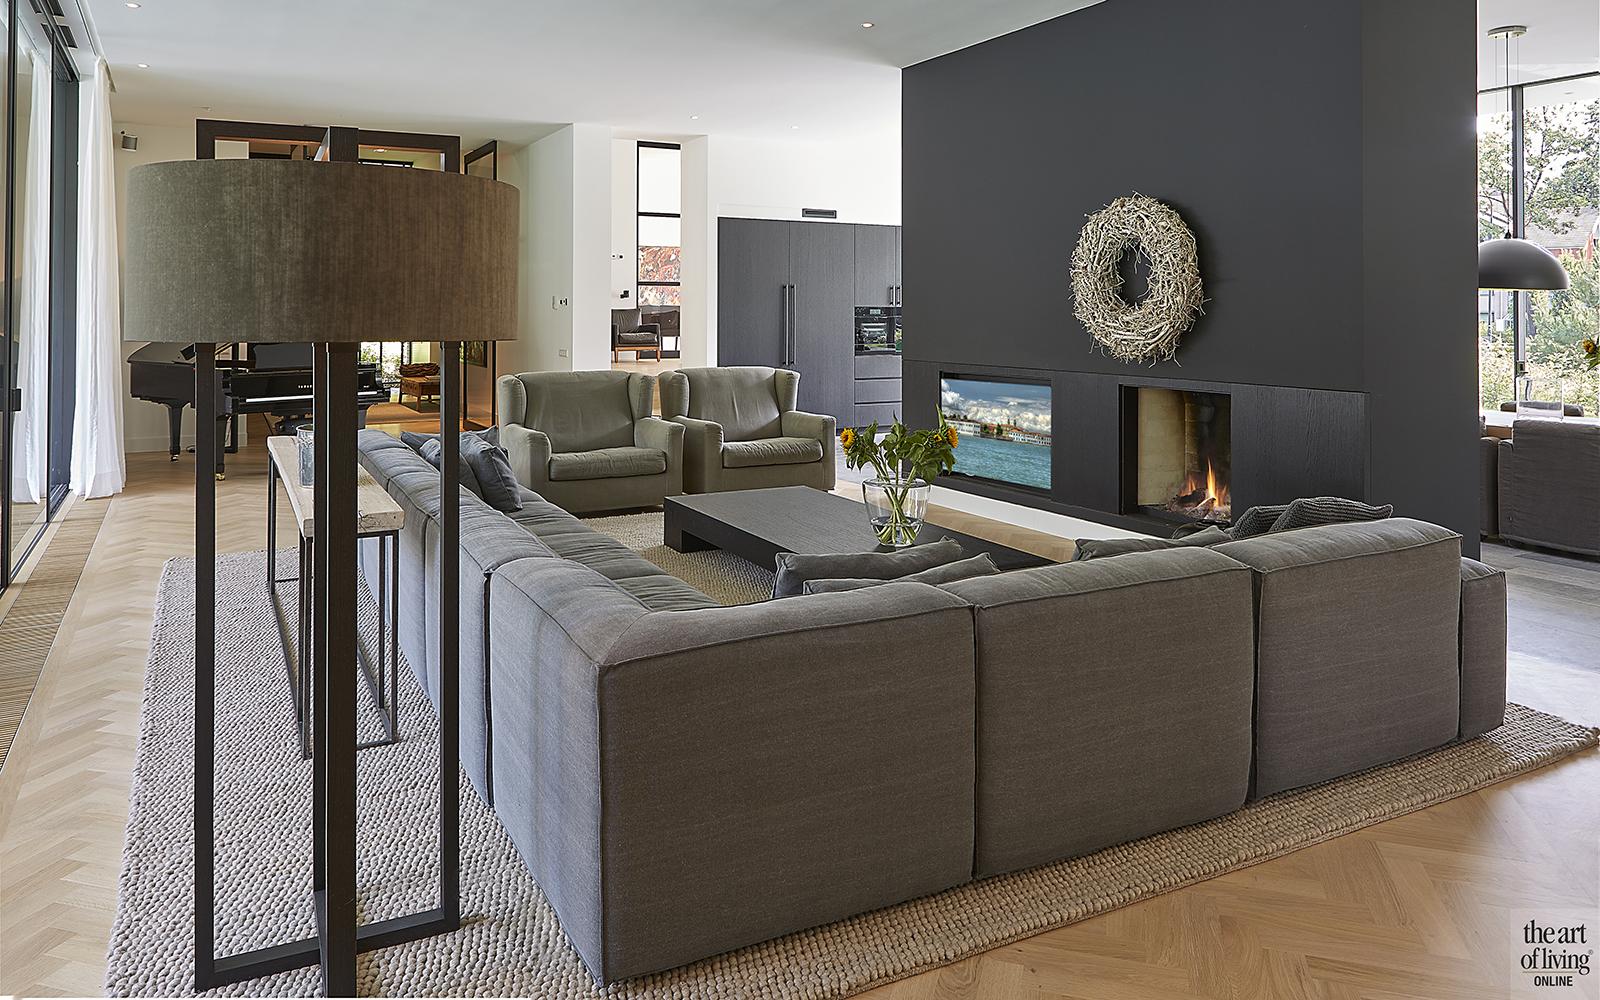 Nieuwbouw villa, Split level, Strak, Modern, Joost van der Sande